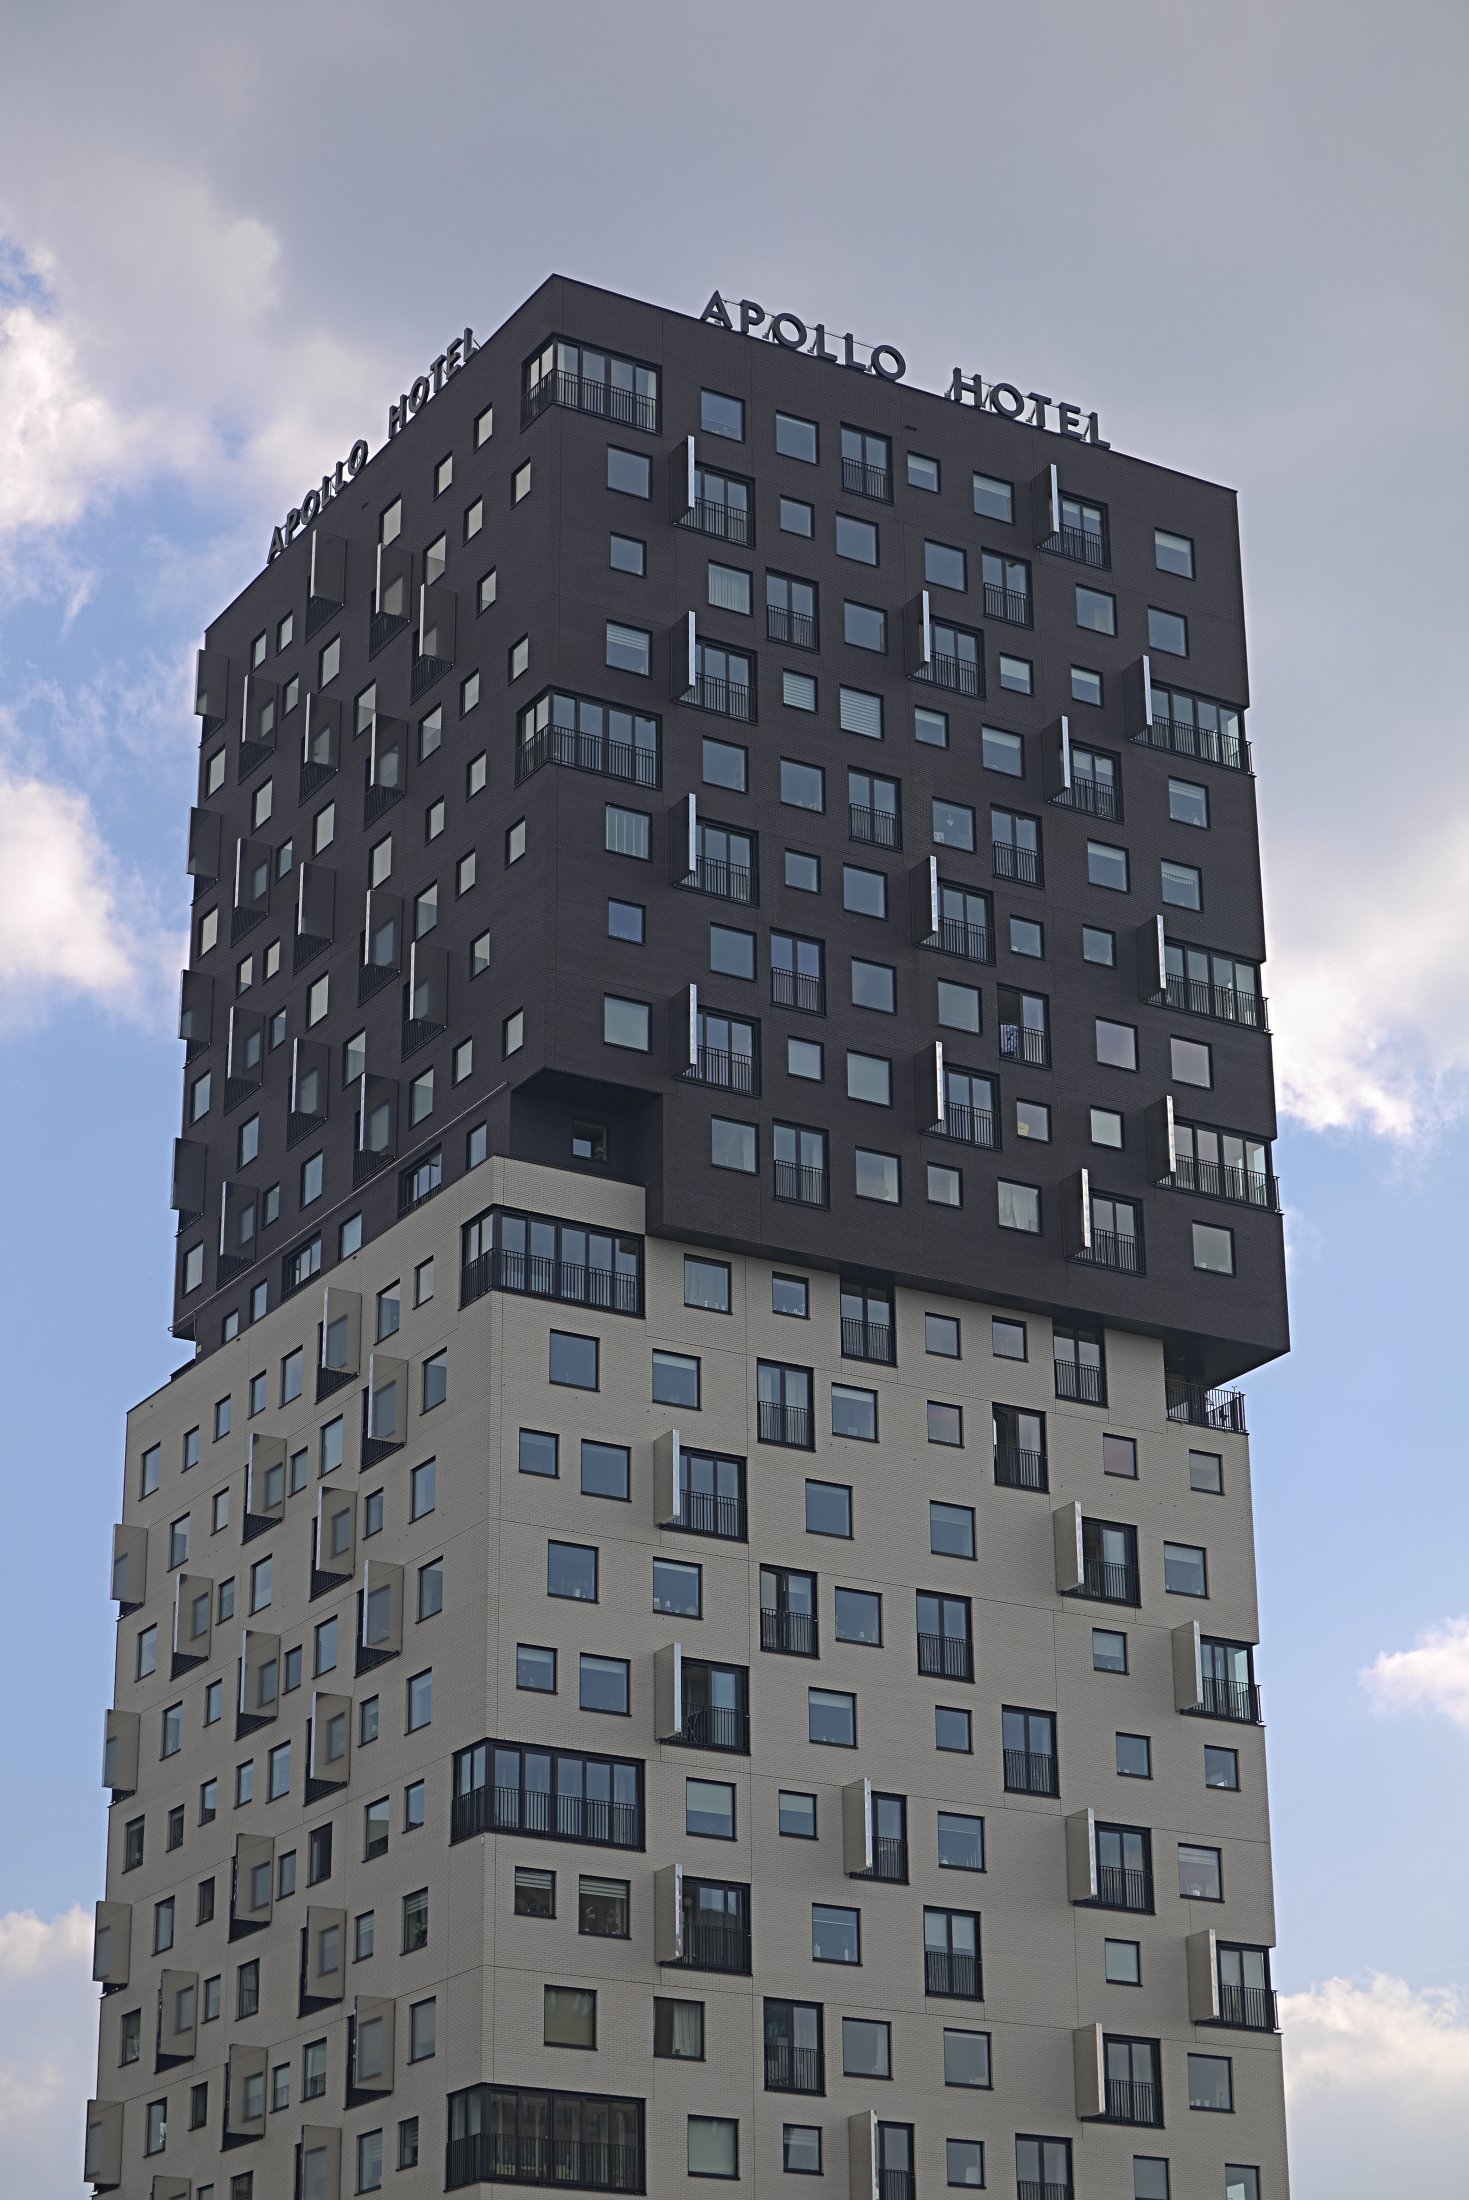 Apollo Hotel in Groningen